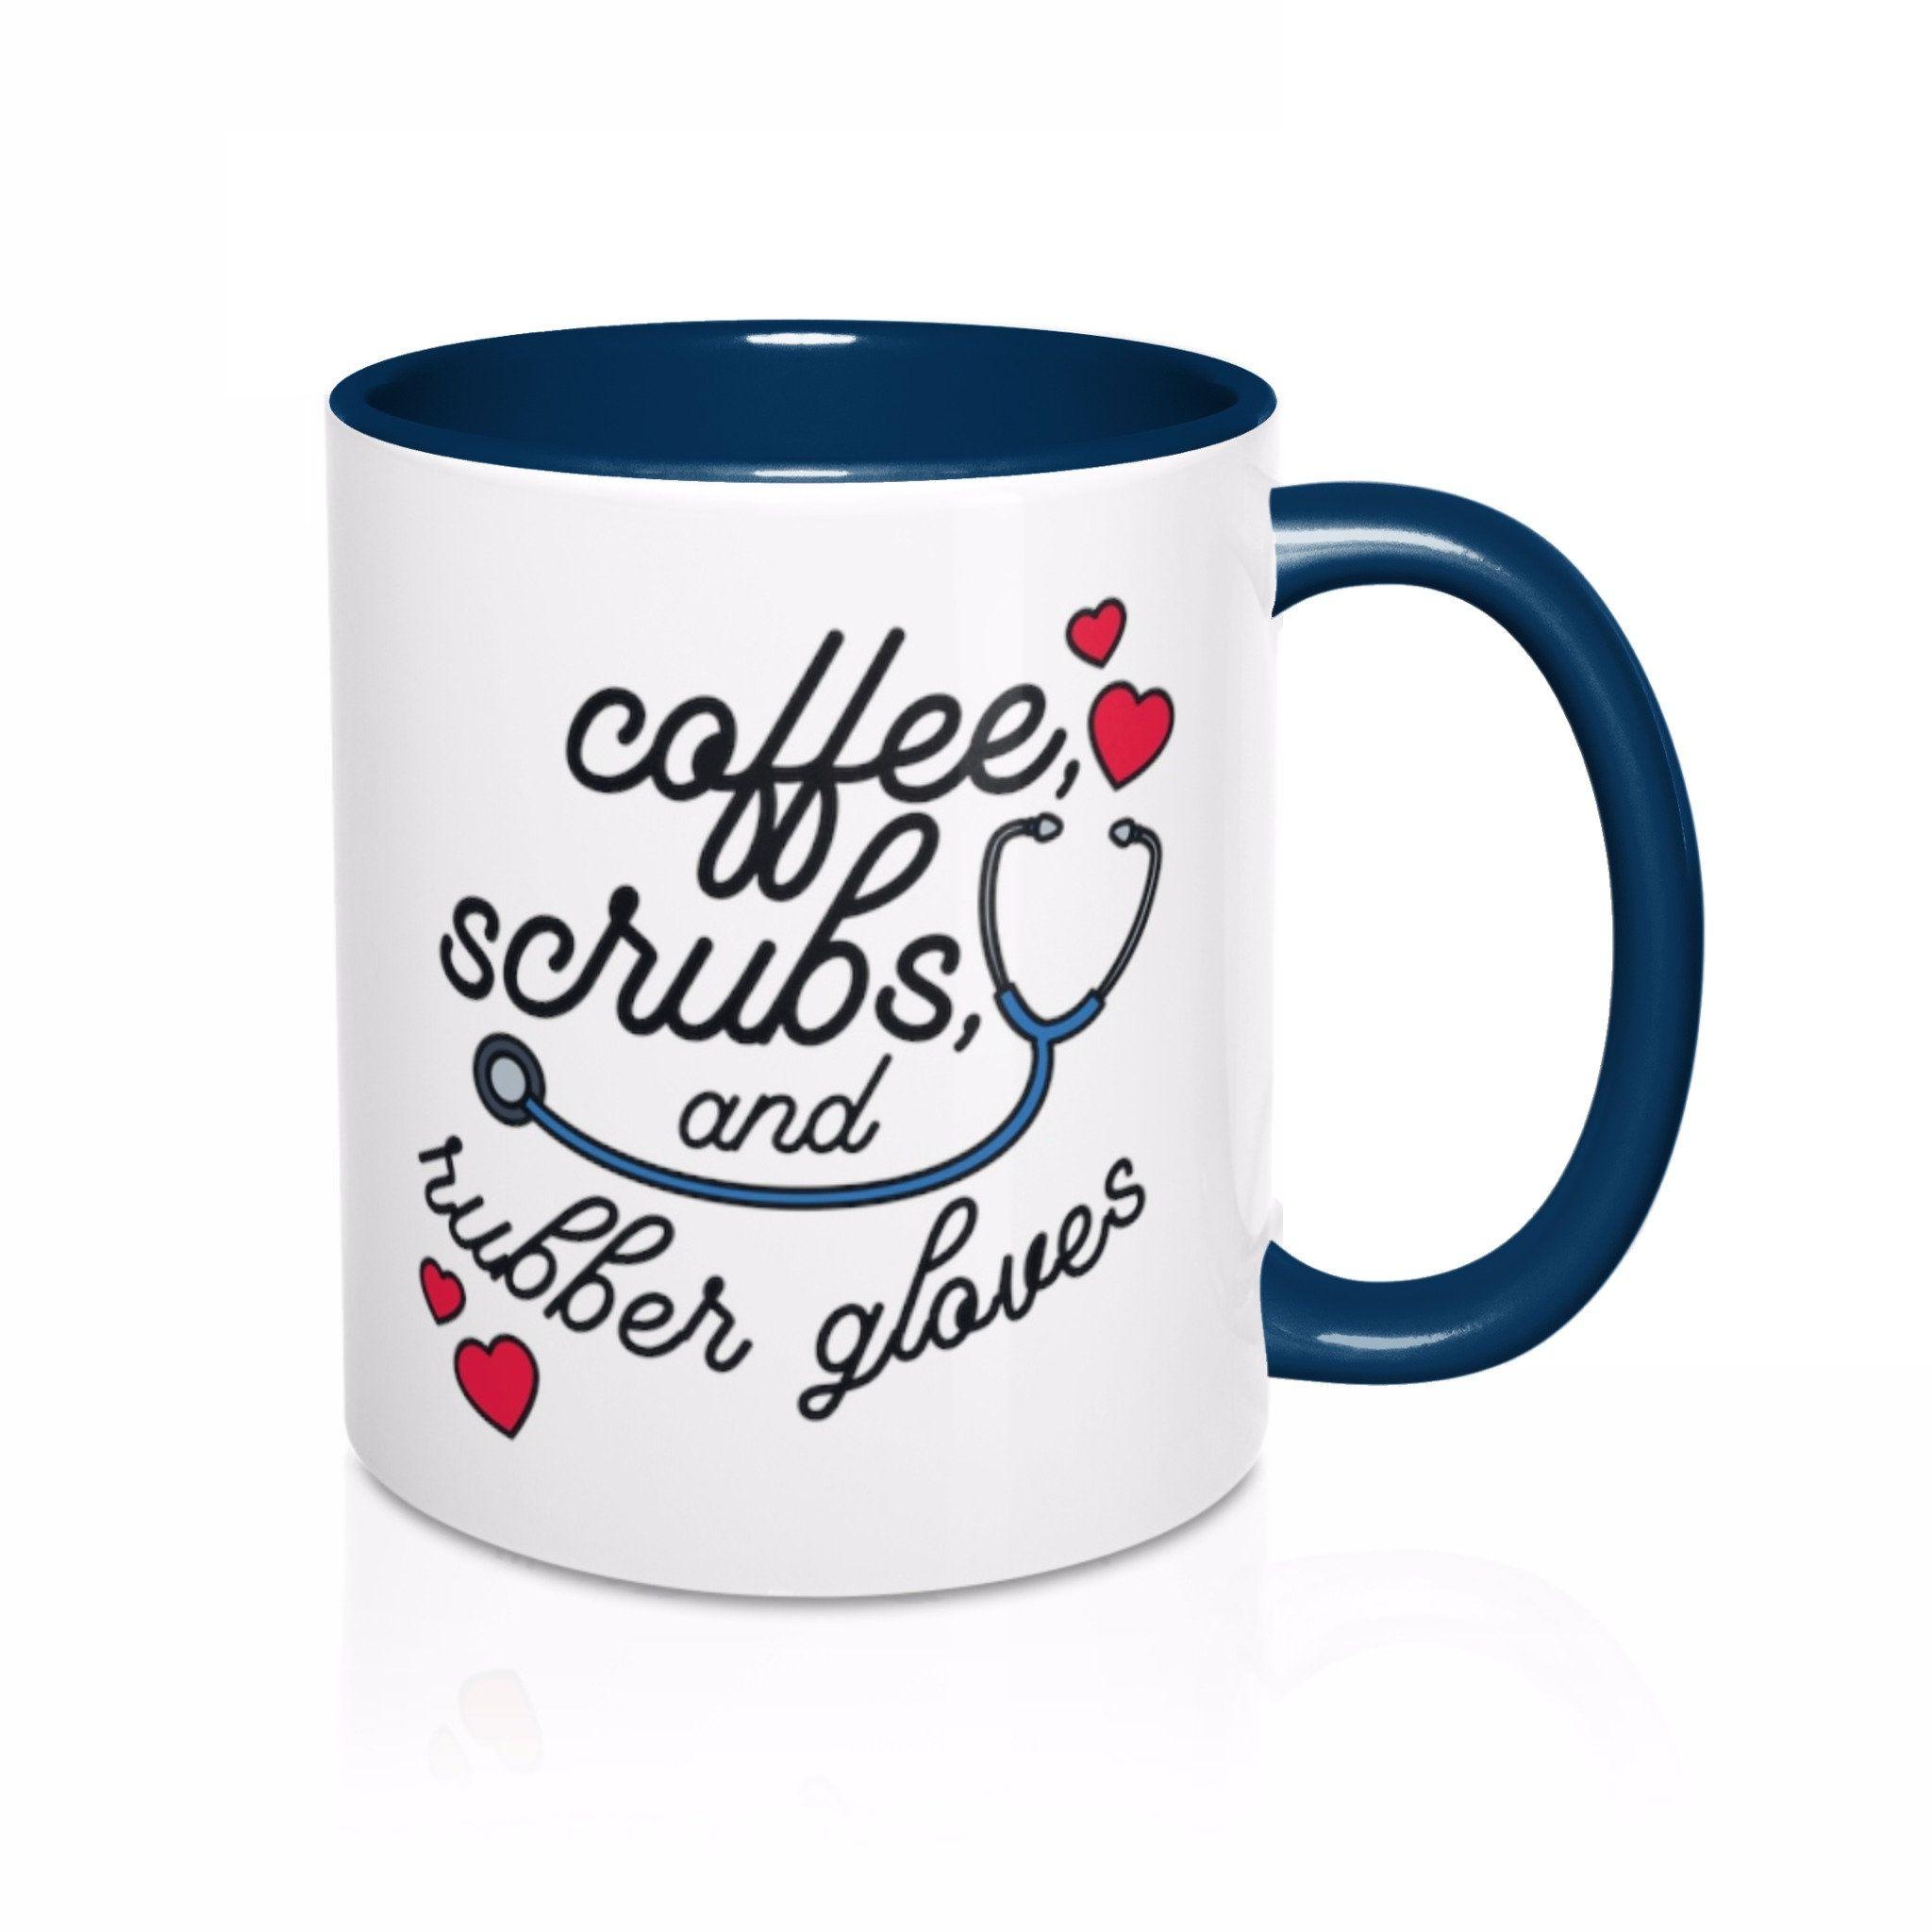 Park Art|My WordPress Blog_Coffee Scrubs And Rubber Gloves Mug